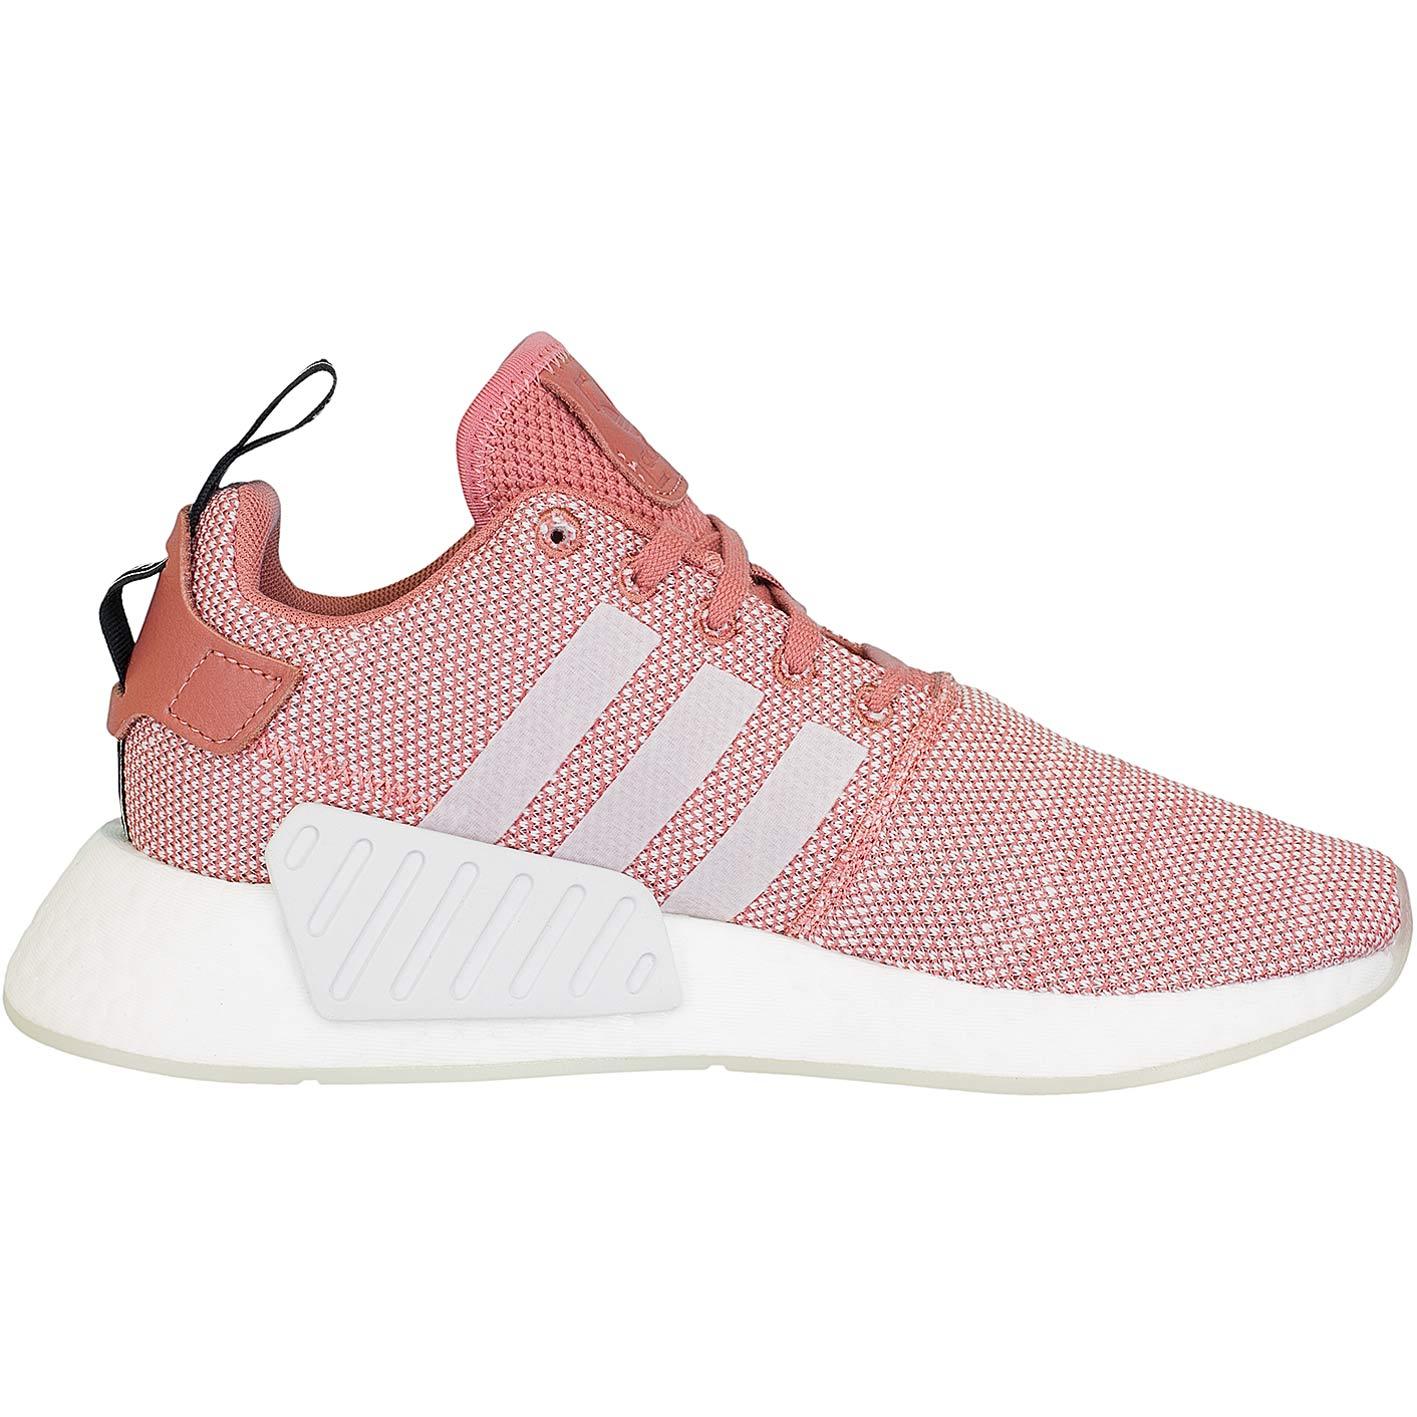 Adidas Originals Damen Sneaker Nmd R2 Ash Pink Hier Bestellen